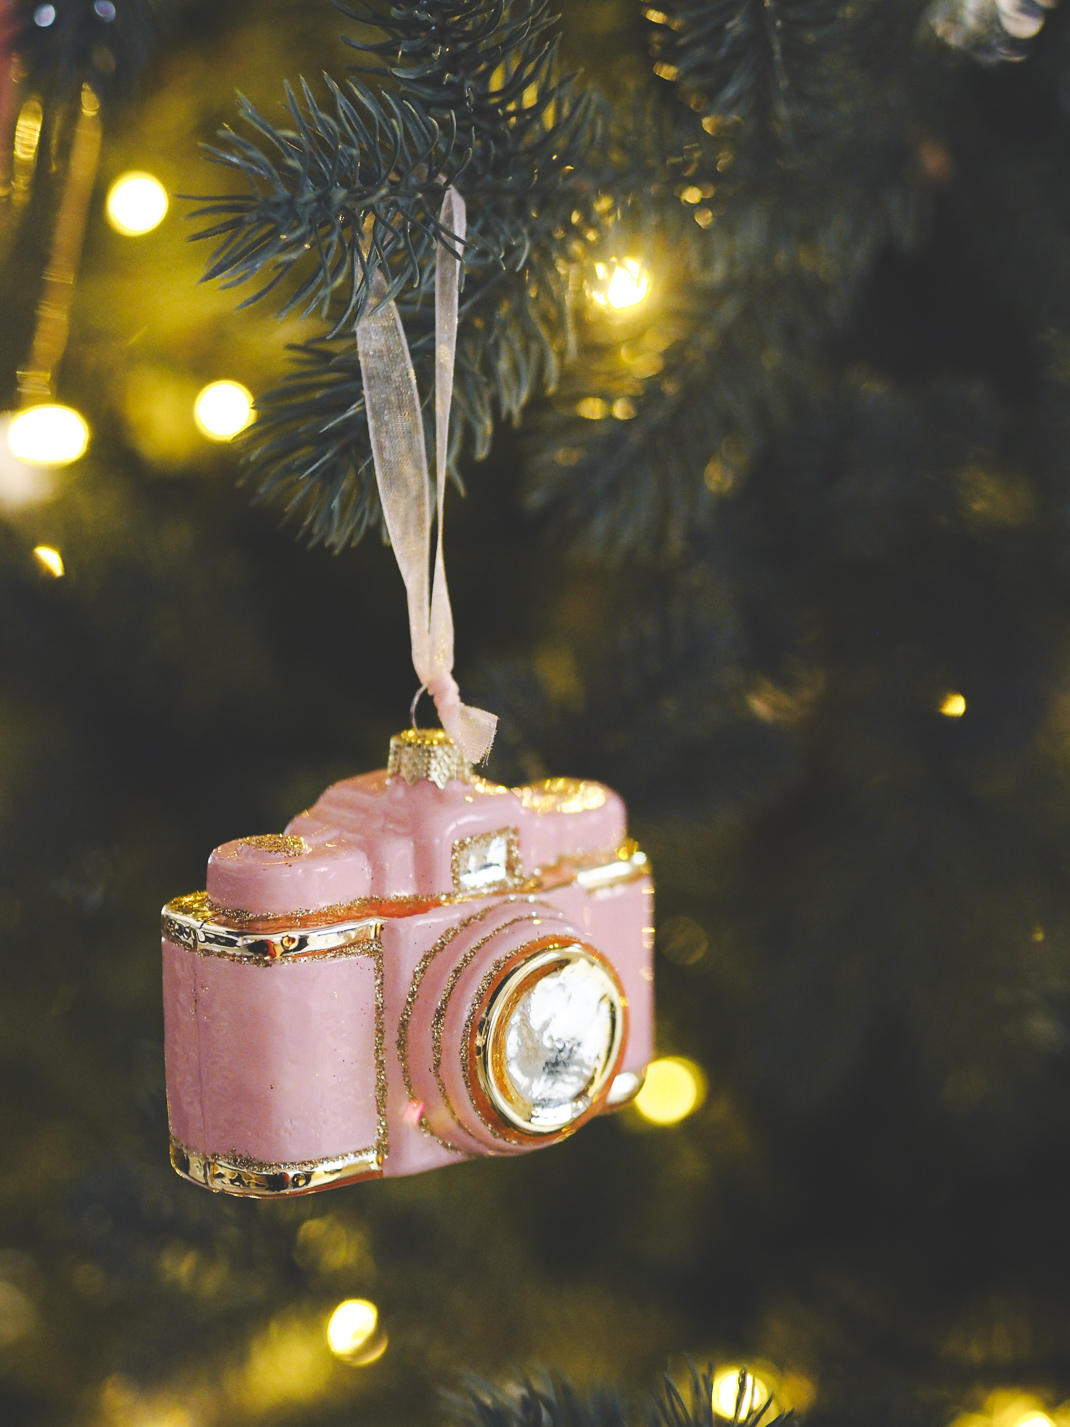 john lewis camera ornament